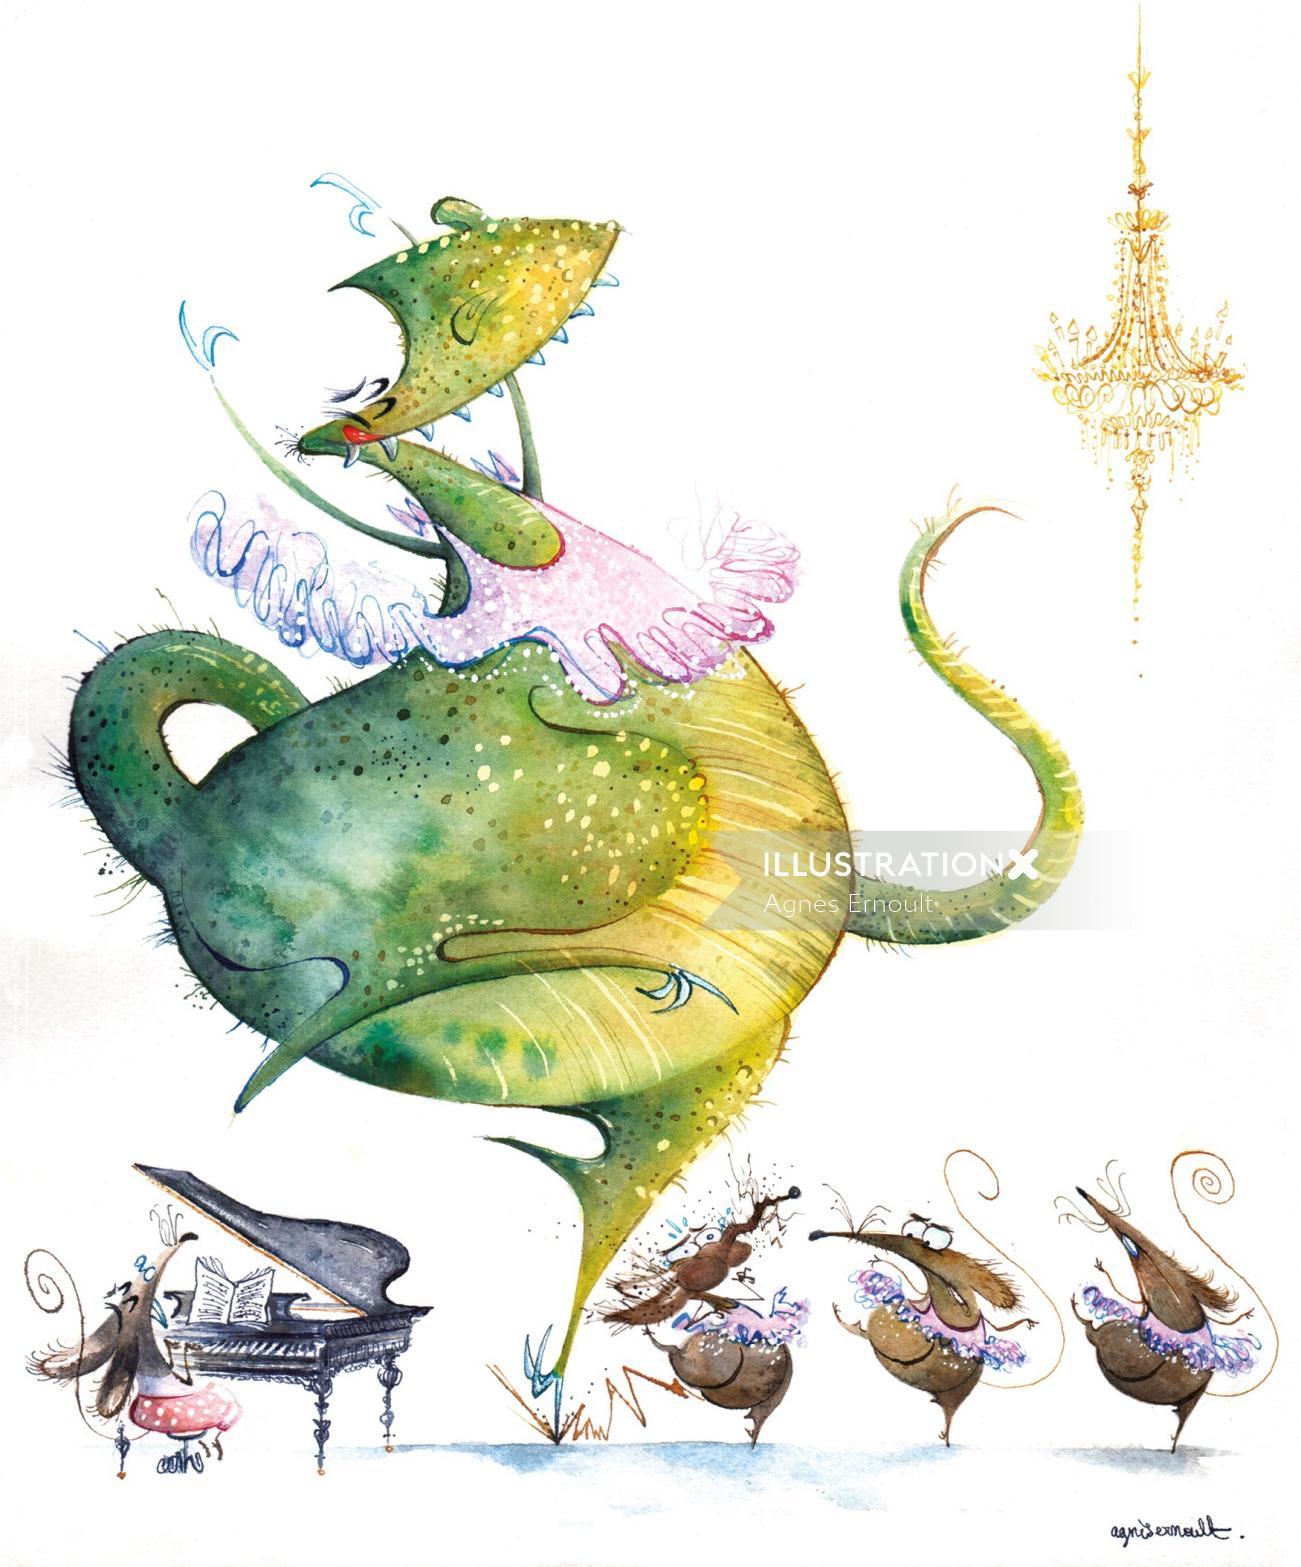 Comic illustration of dancing dragon